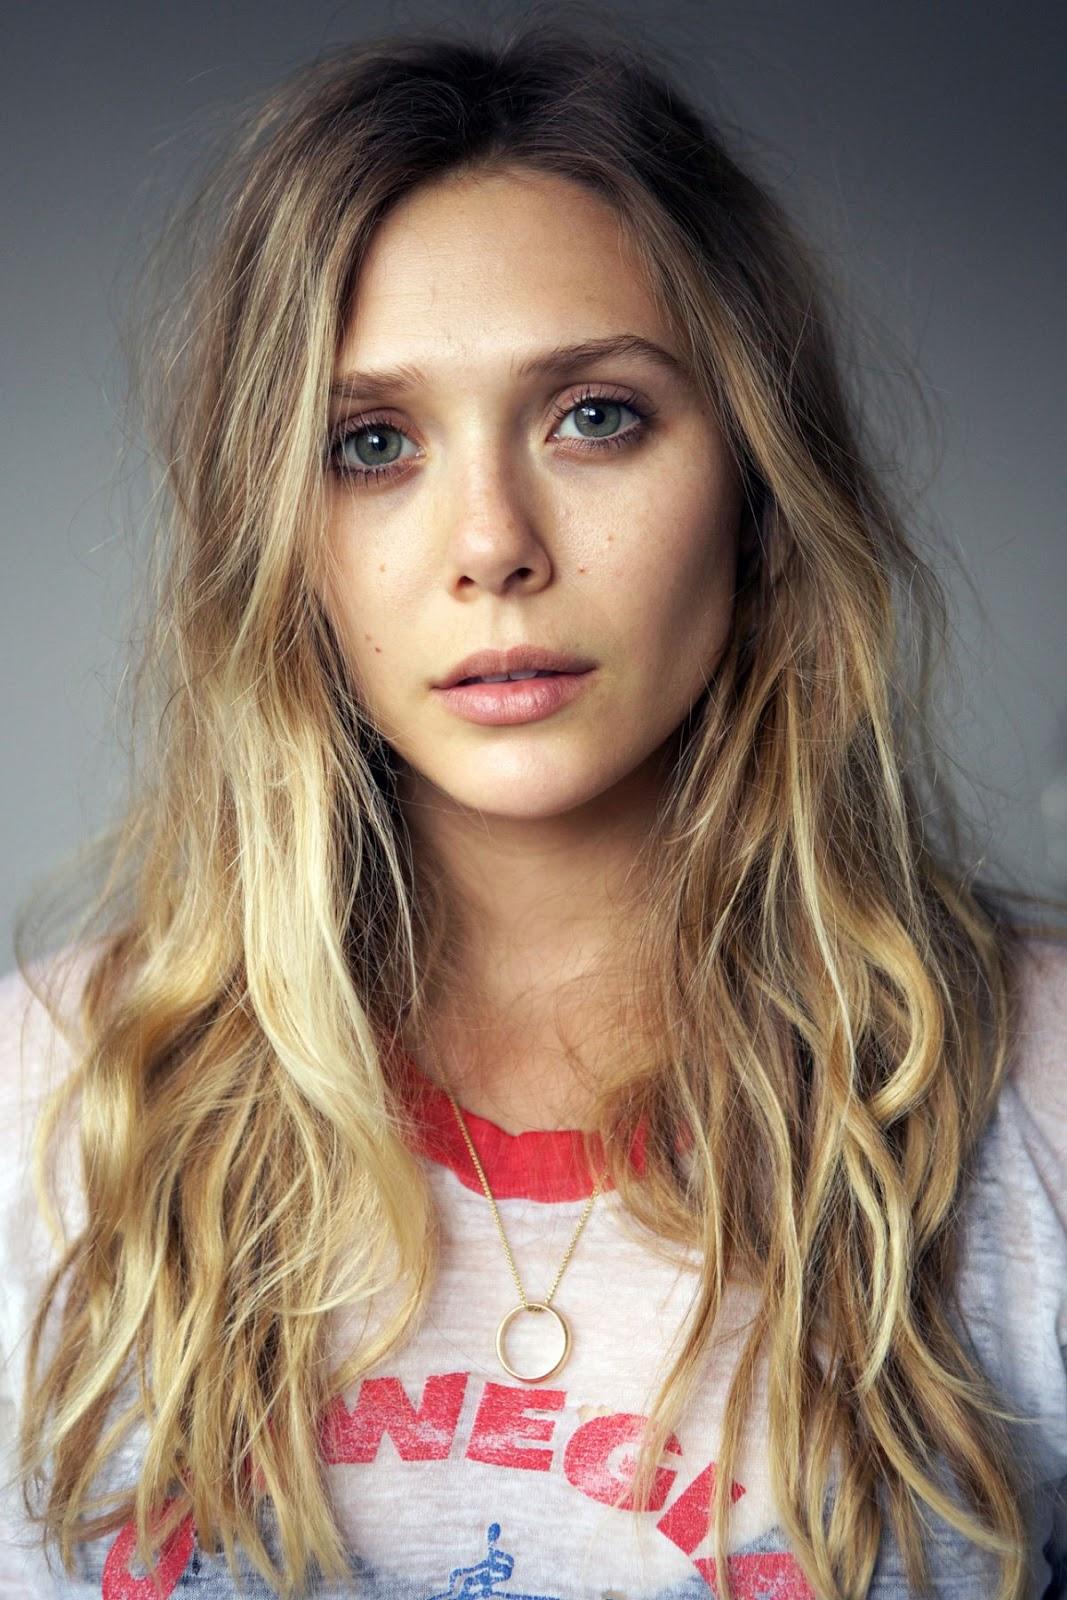 86 <b>Elizabeth Olsen</b> HD <b>Wallpapers</b> | <b>Backgrounds</b> - <b>Wallpaper</b> Abyss